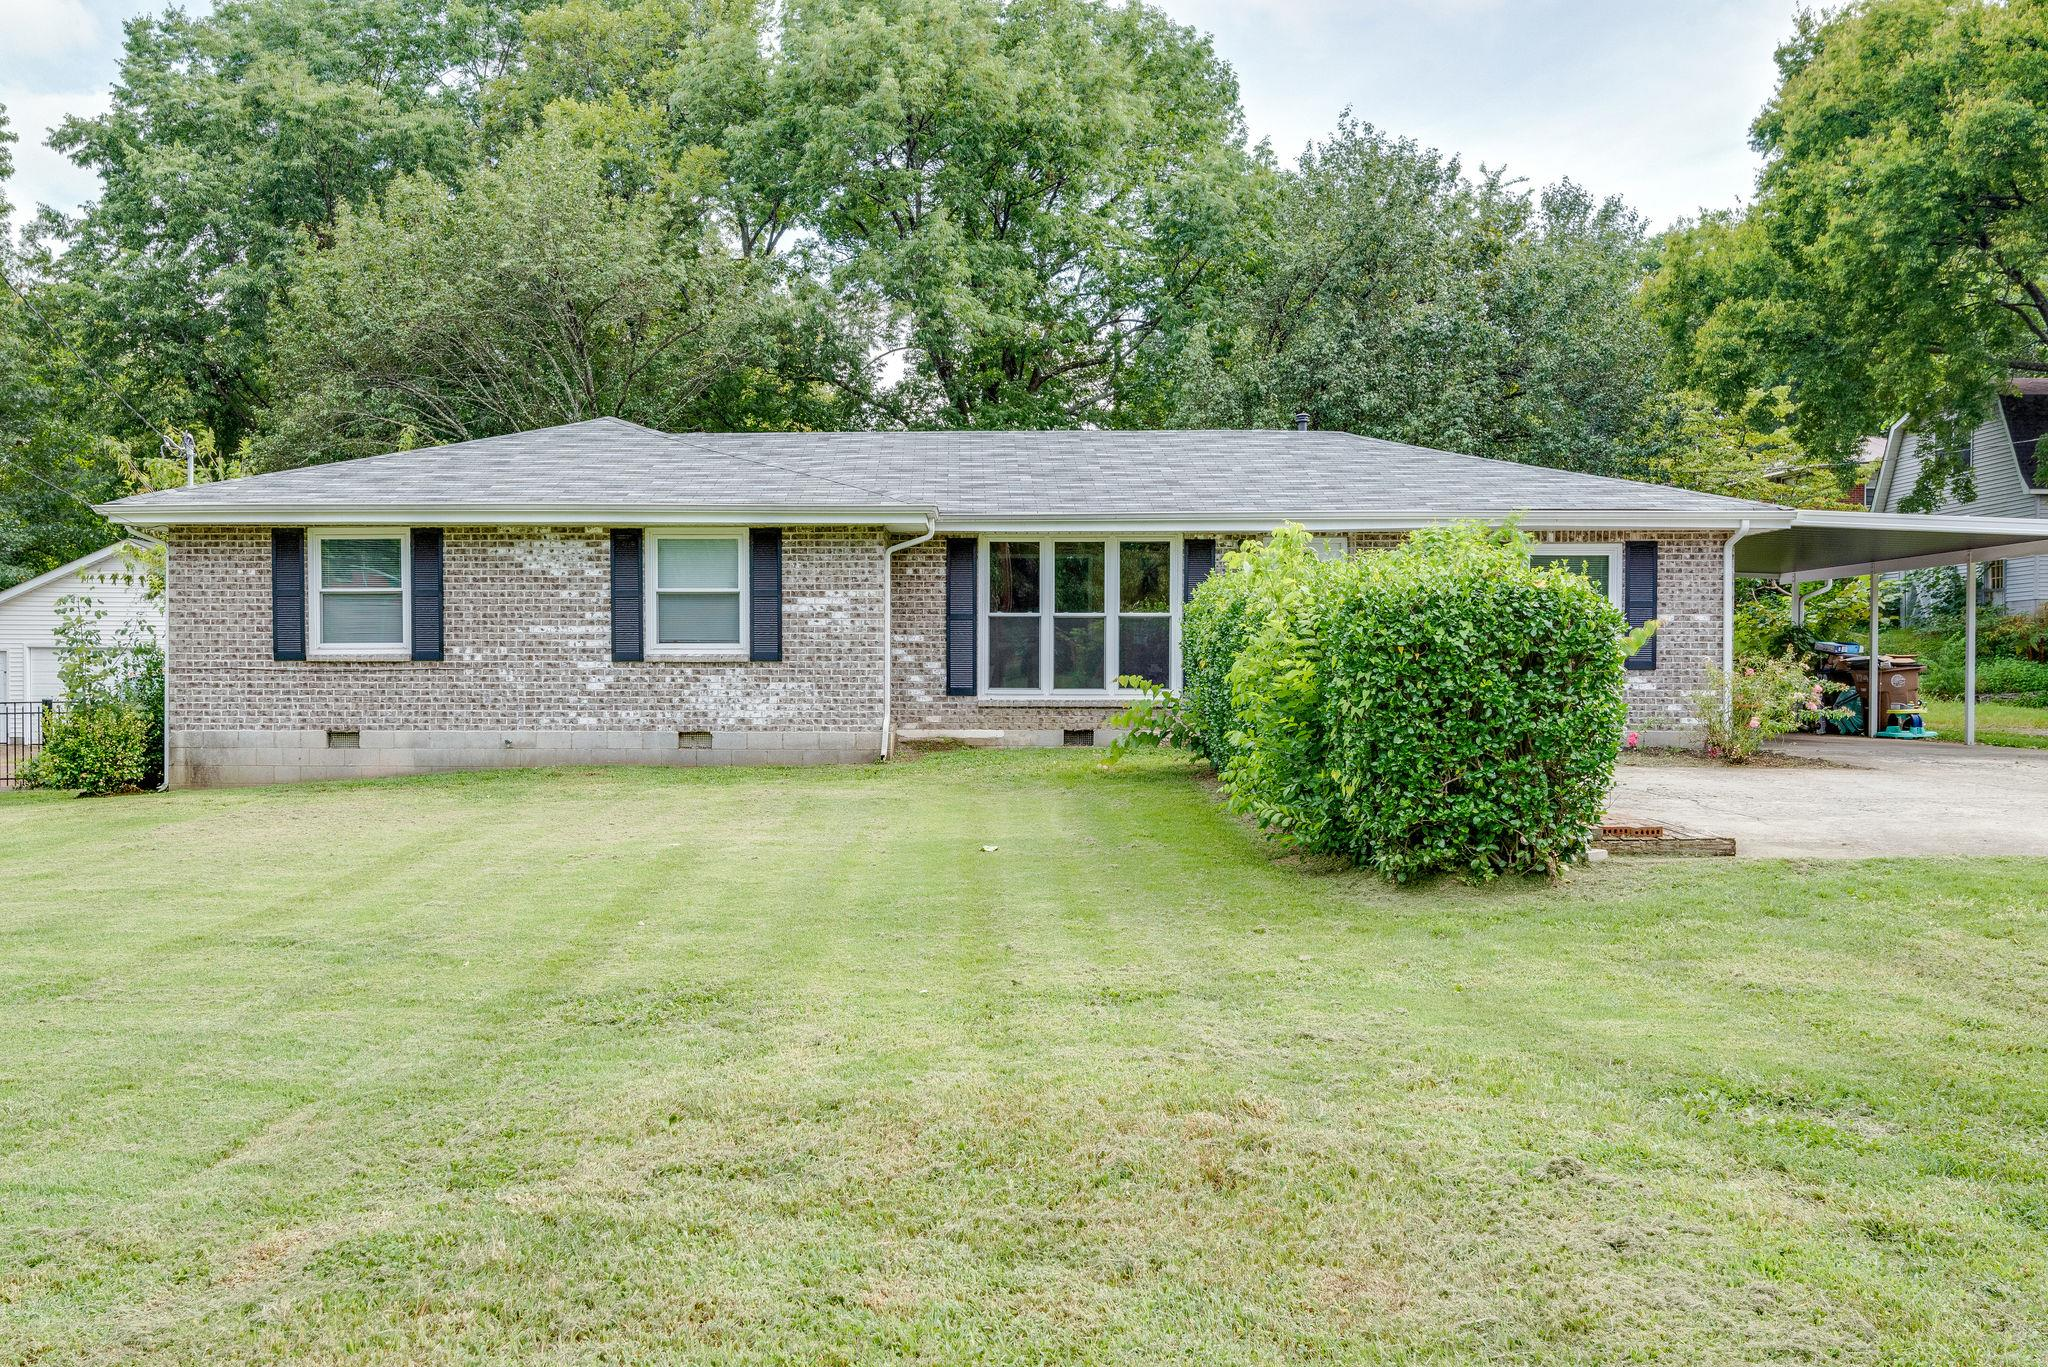 179 McCall St, Nashville, TN 37211 - Nashville, TN real estate listing